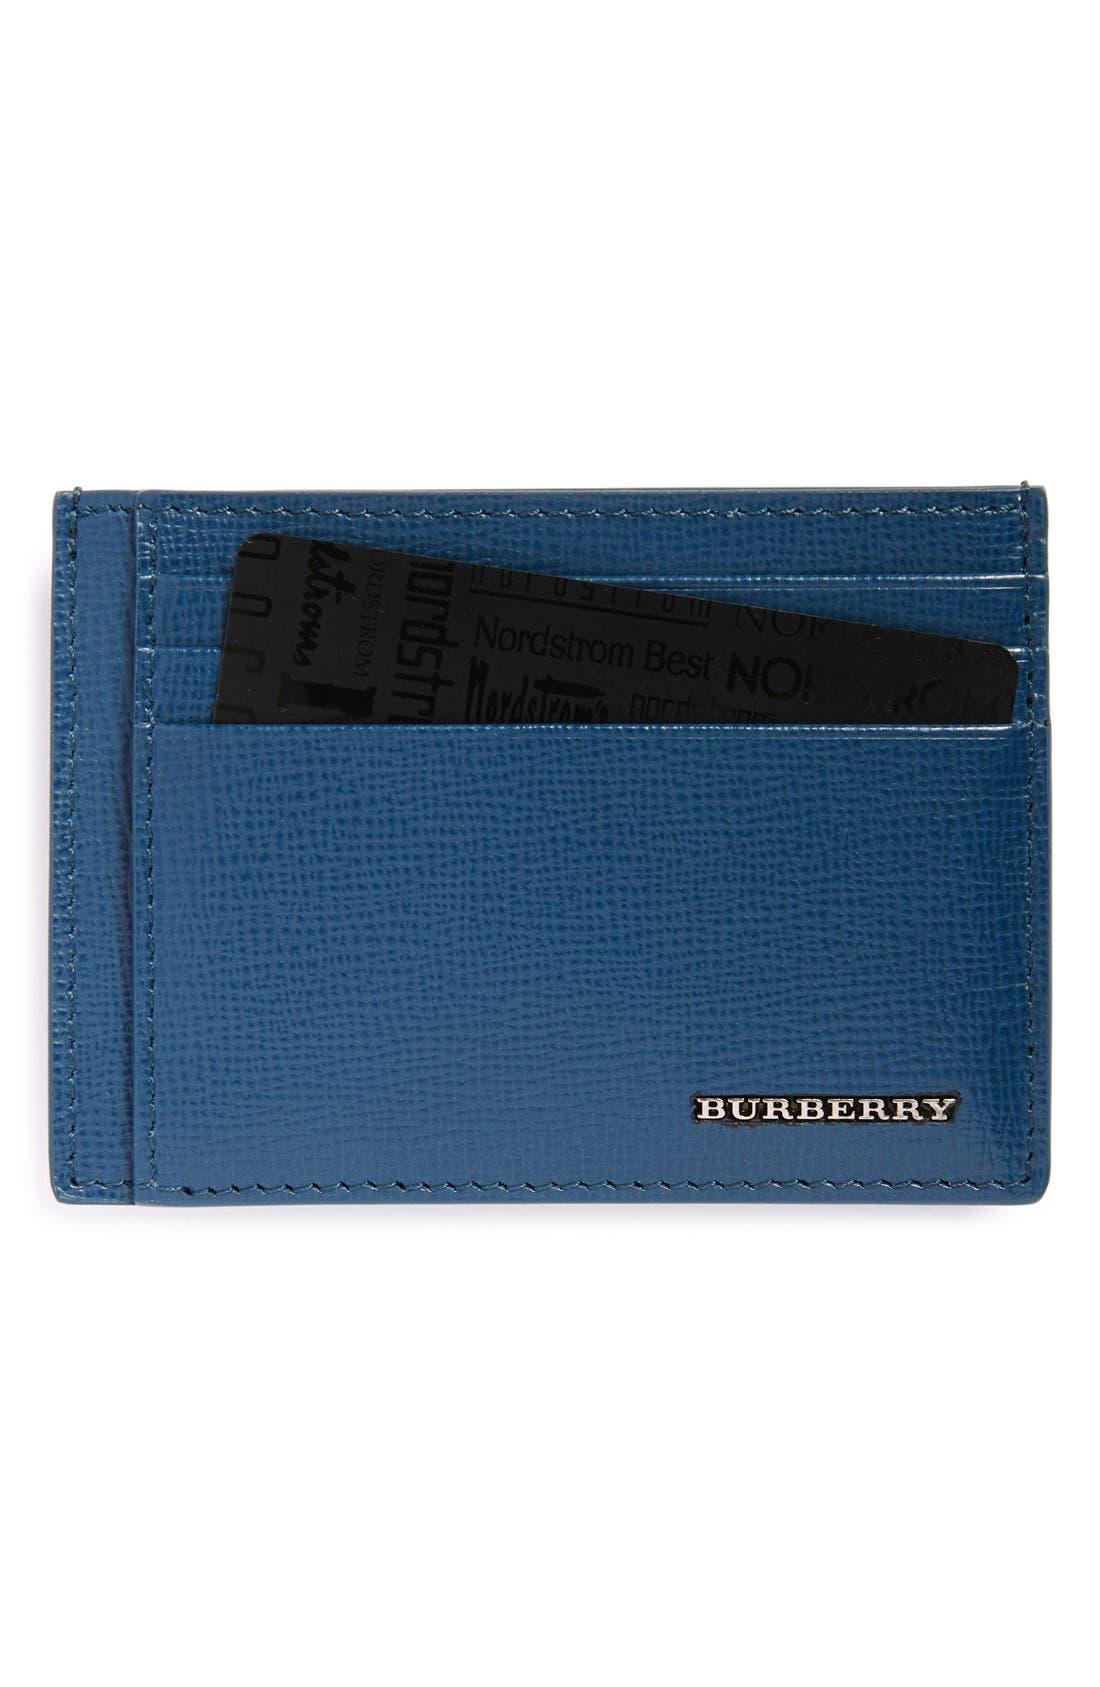 BURBERRY,                             'Bernie' Leather Card Case,                             Main thumbnail 1, color,                             452